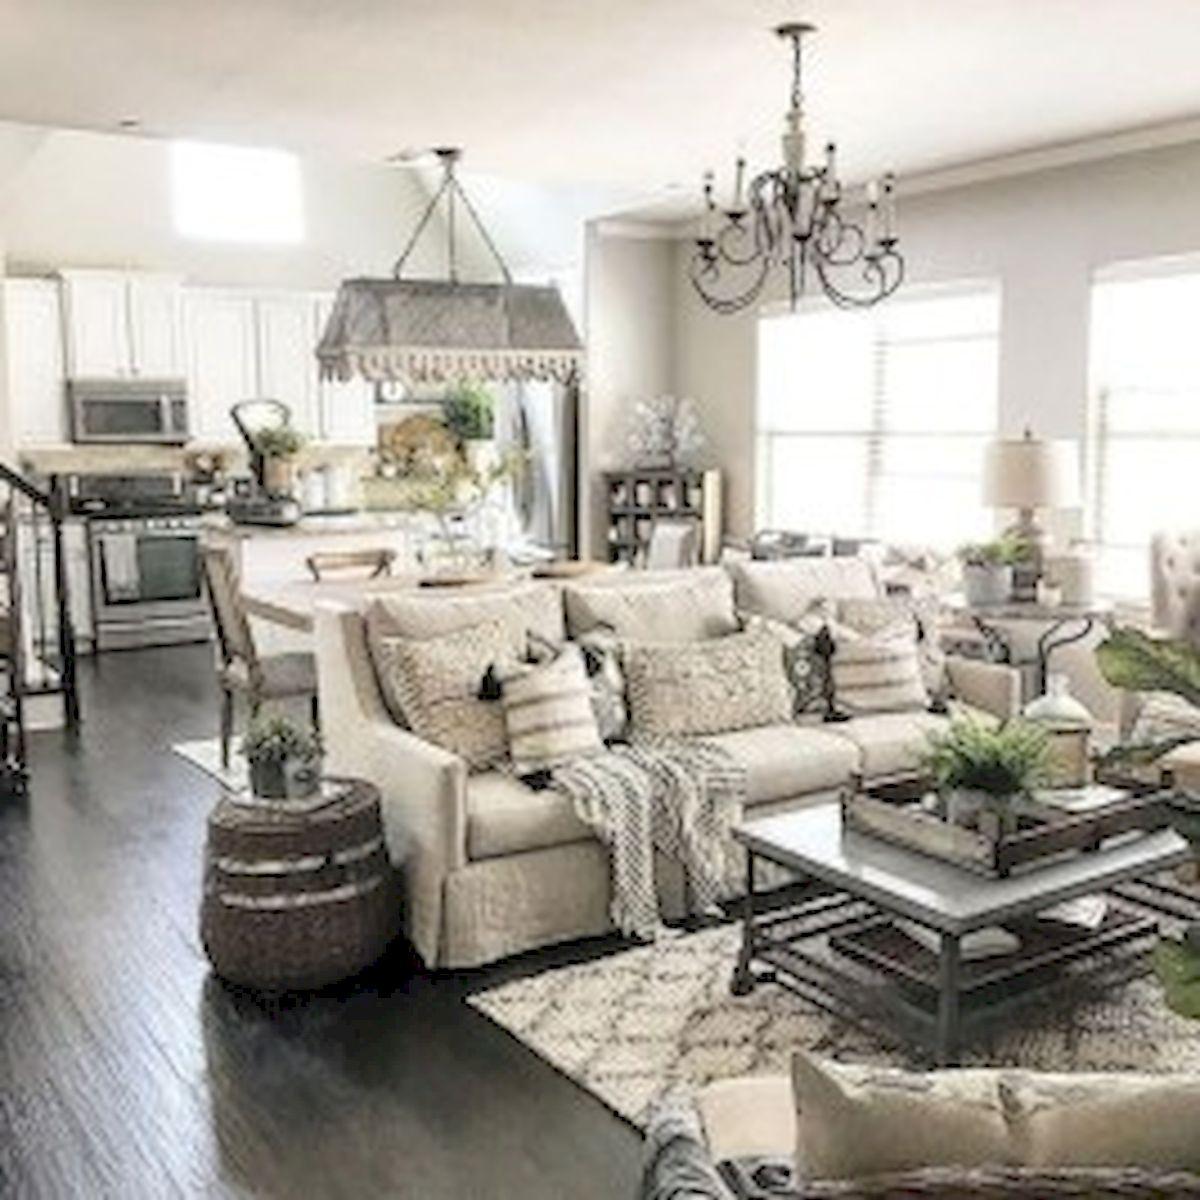 40+ Awesome Farmhouse Design Ideas For Living Room (20)